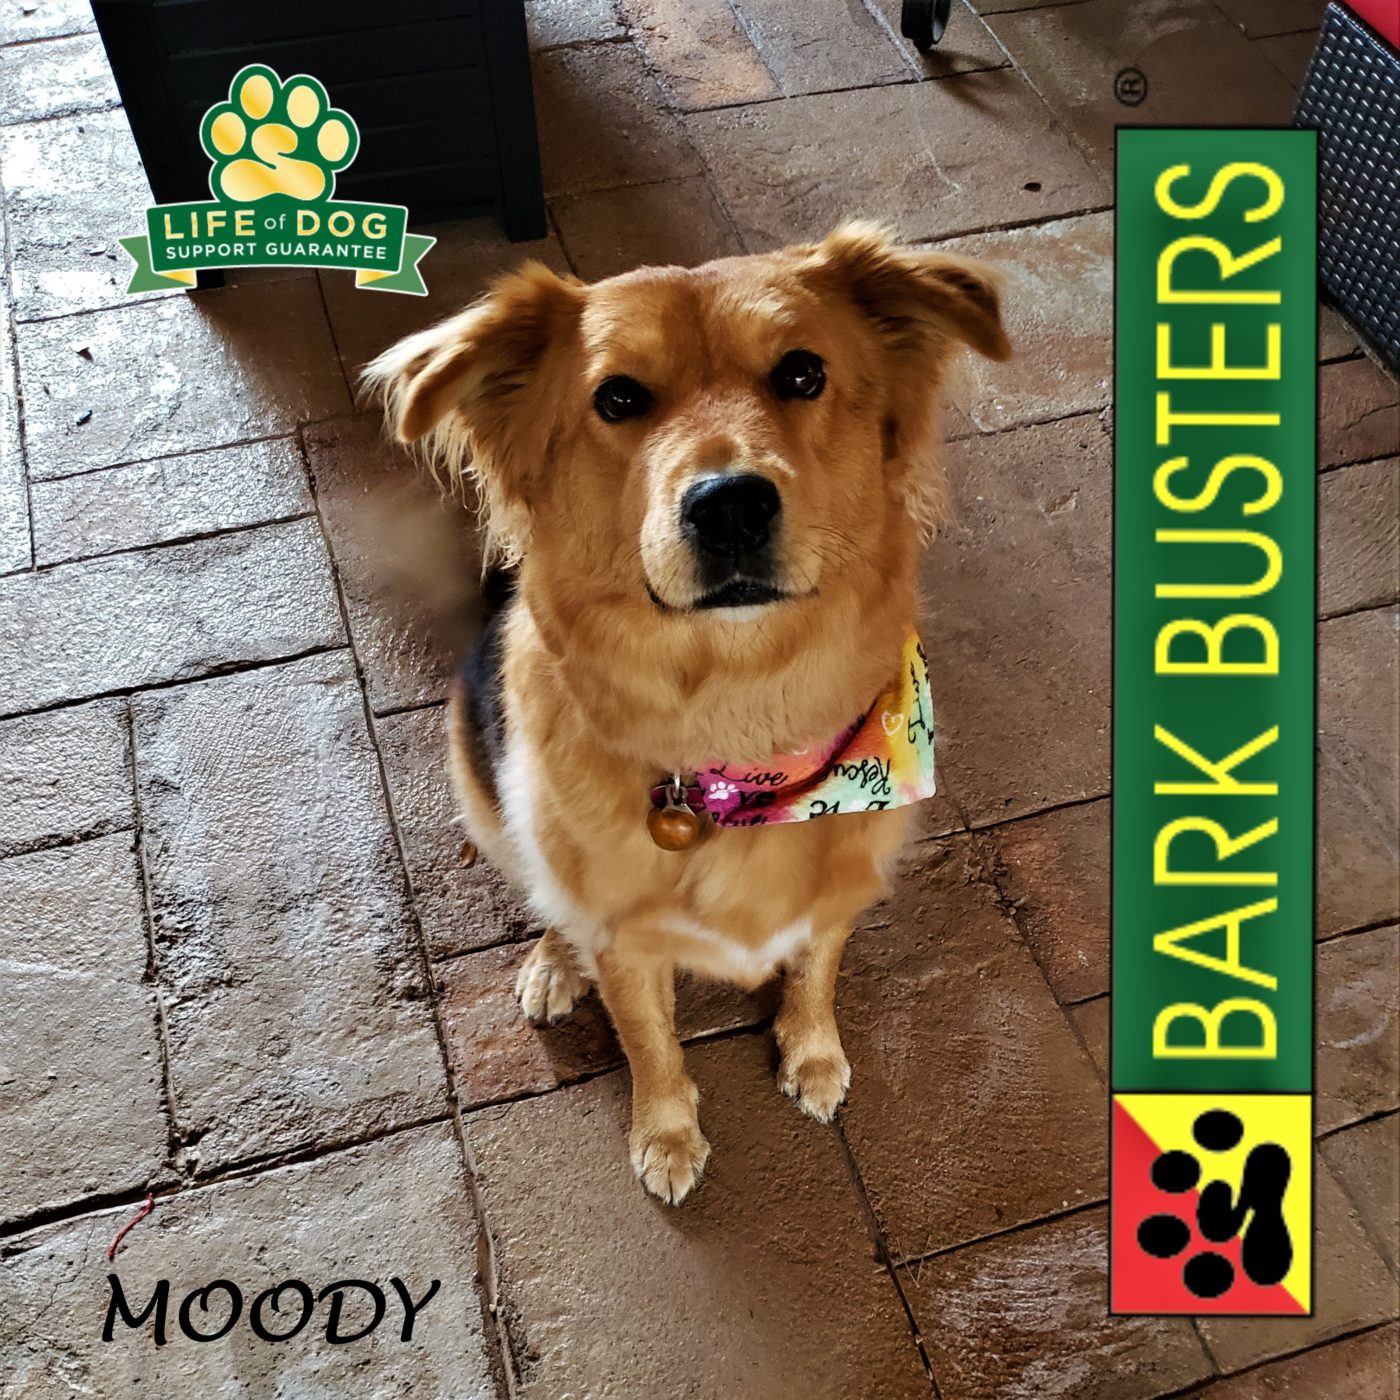 #goldenretriever #germanshepherd #mixeddogsarebeautiful #obediencetraining #leashtraining #dogtrainingroundrock #dogtrainernearme #barkbusters #inhomedogtraining